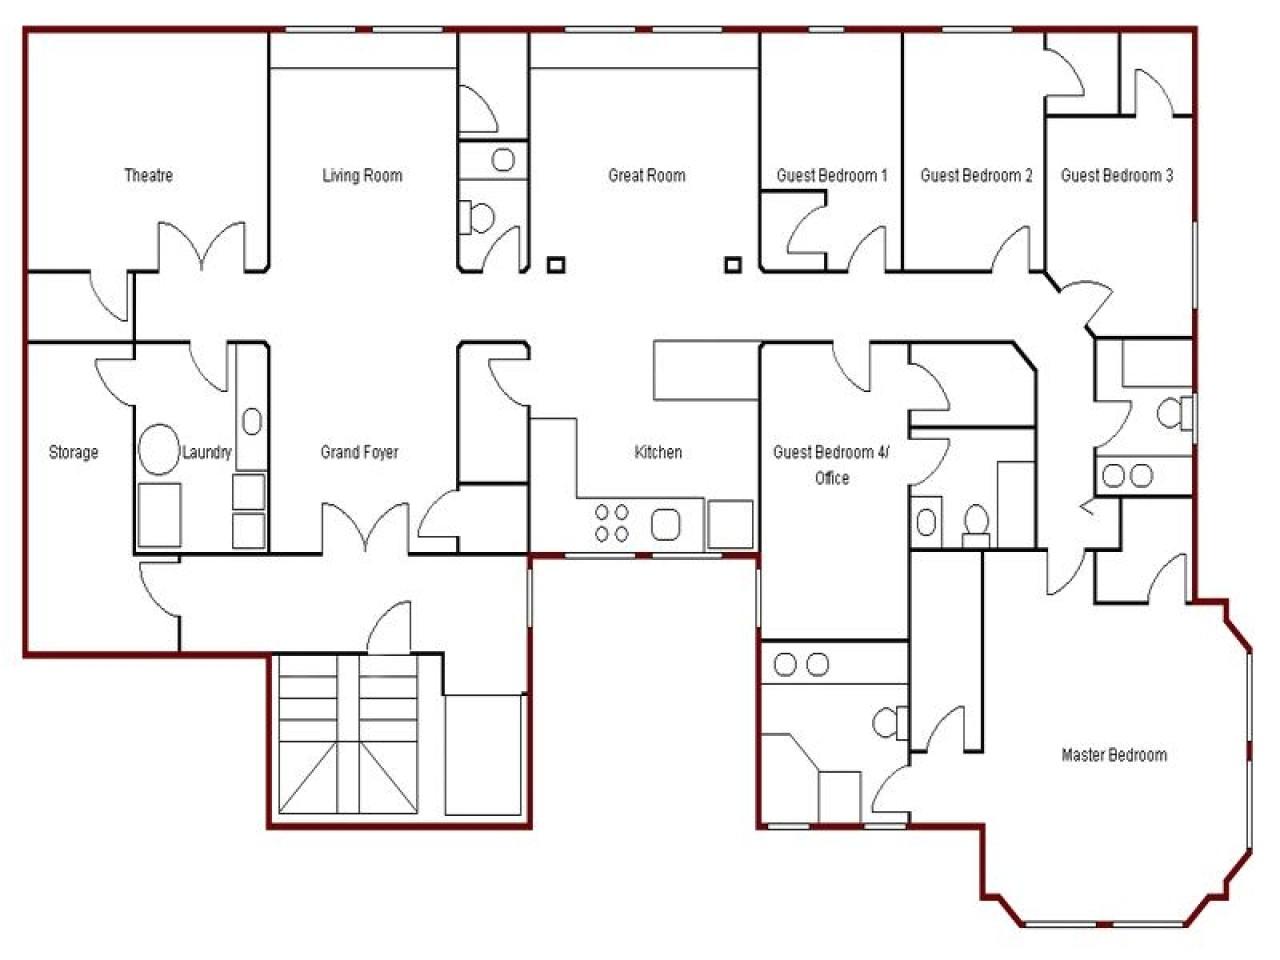 bd8febfed31a552b create simple floor plan simple house drawing plan